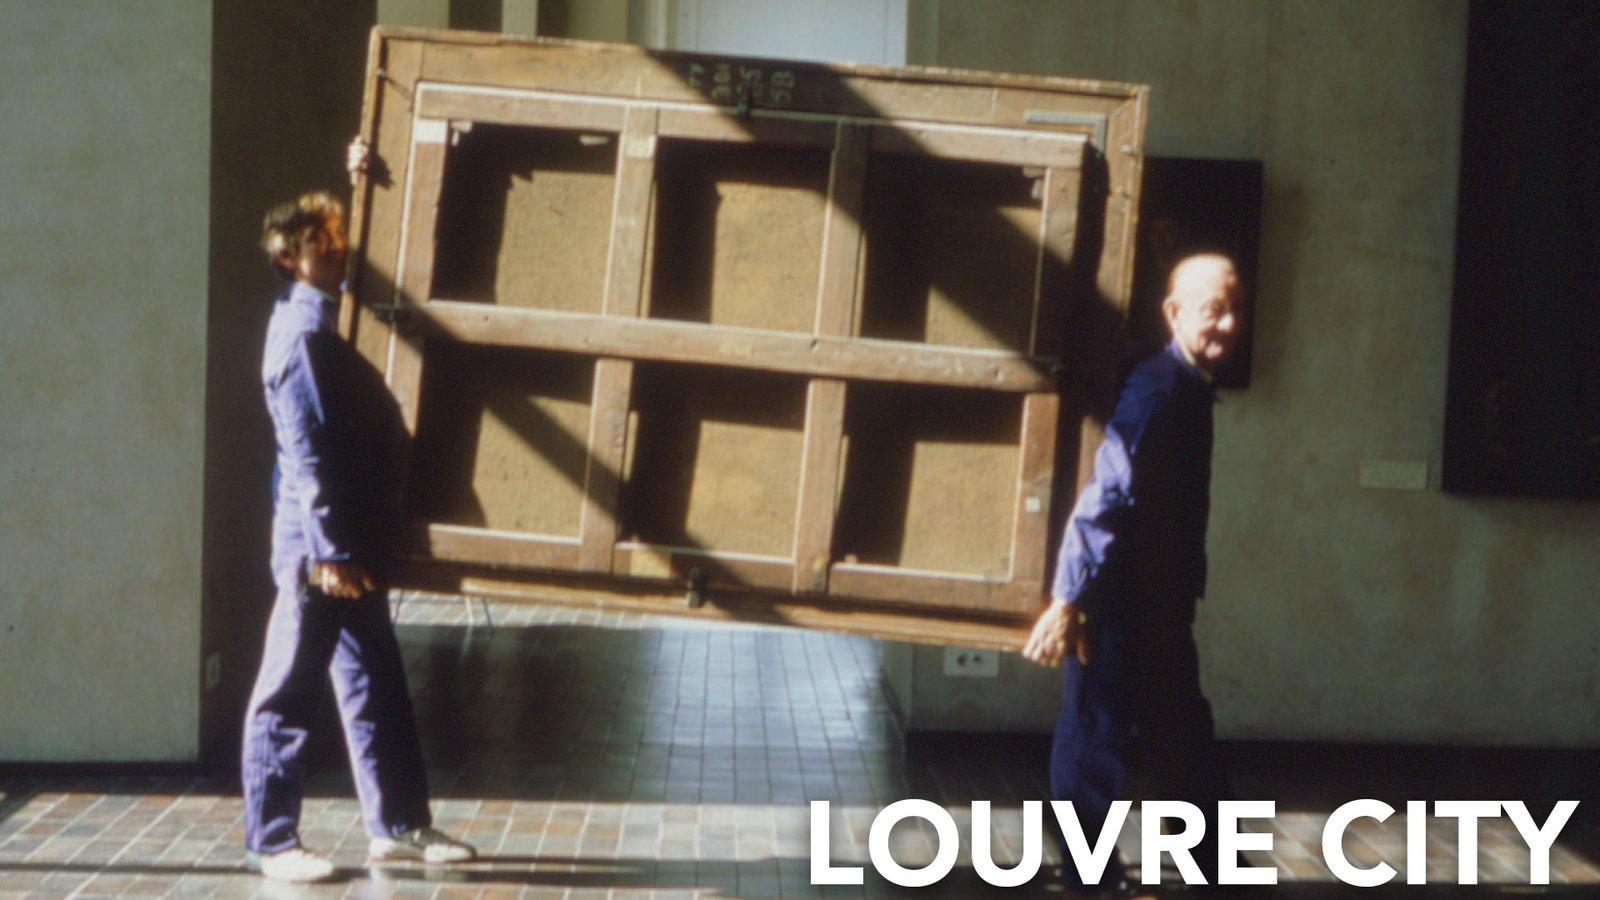 Louvre City